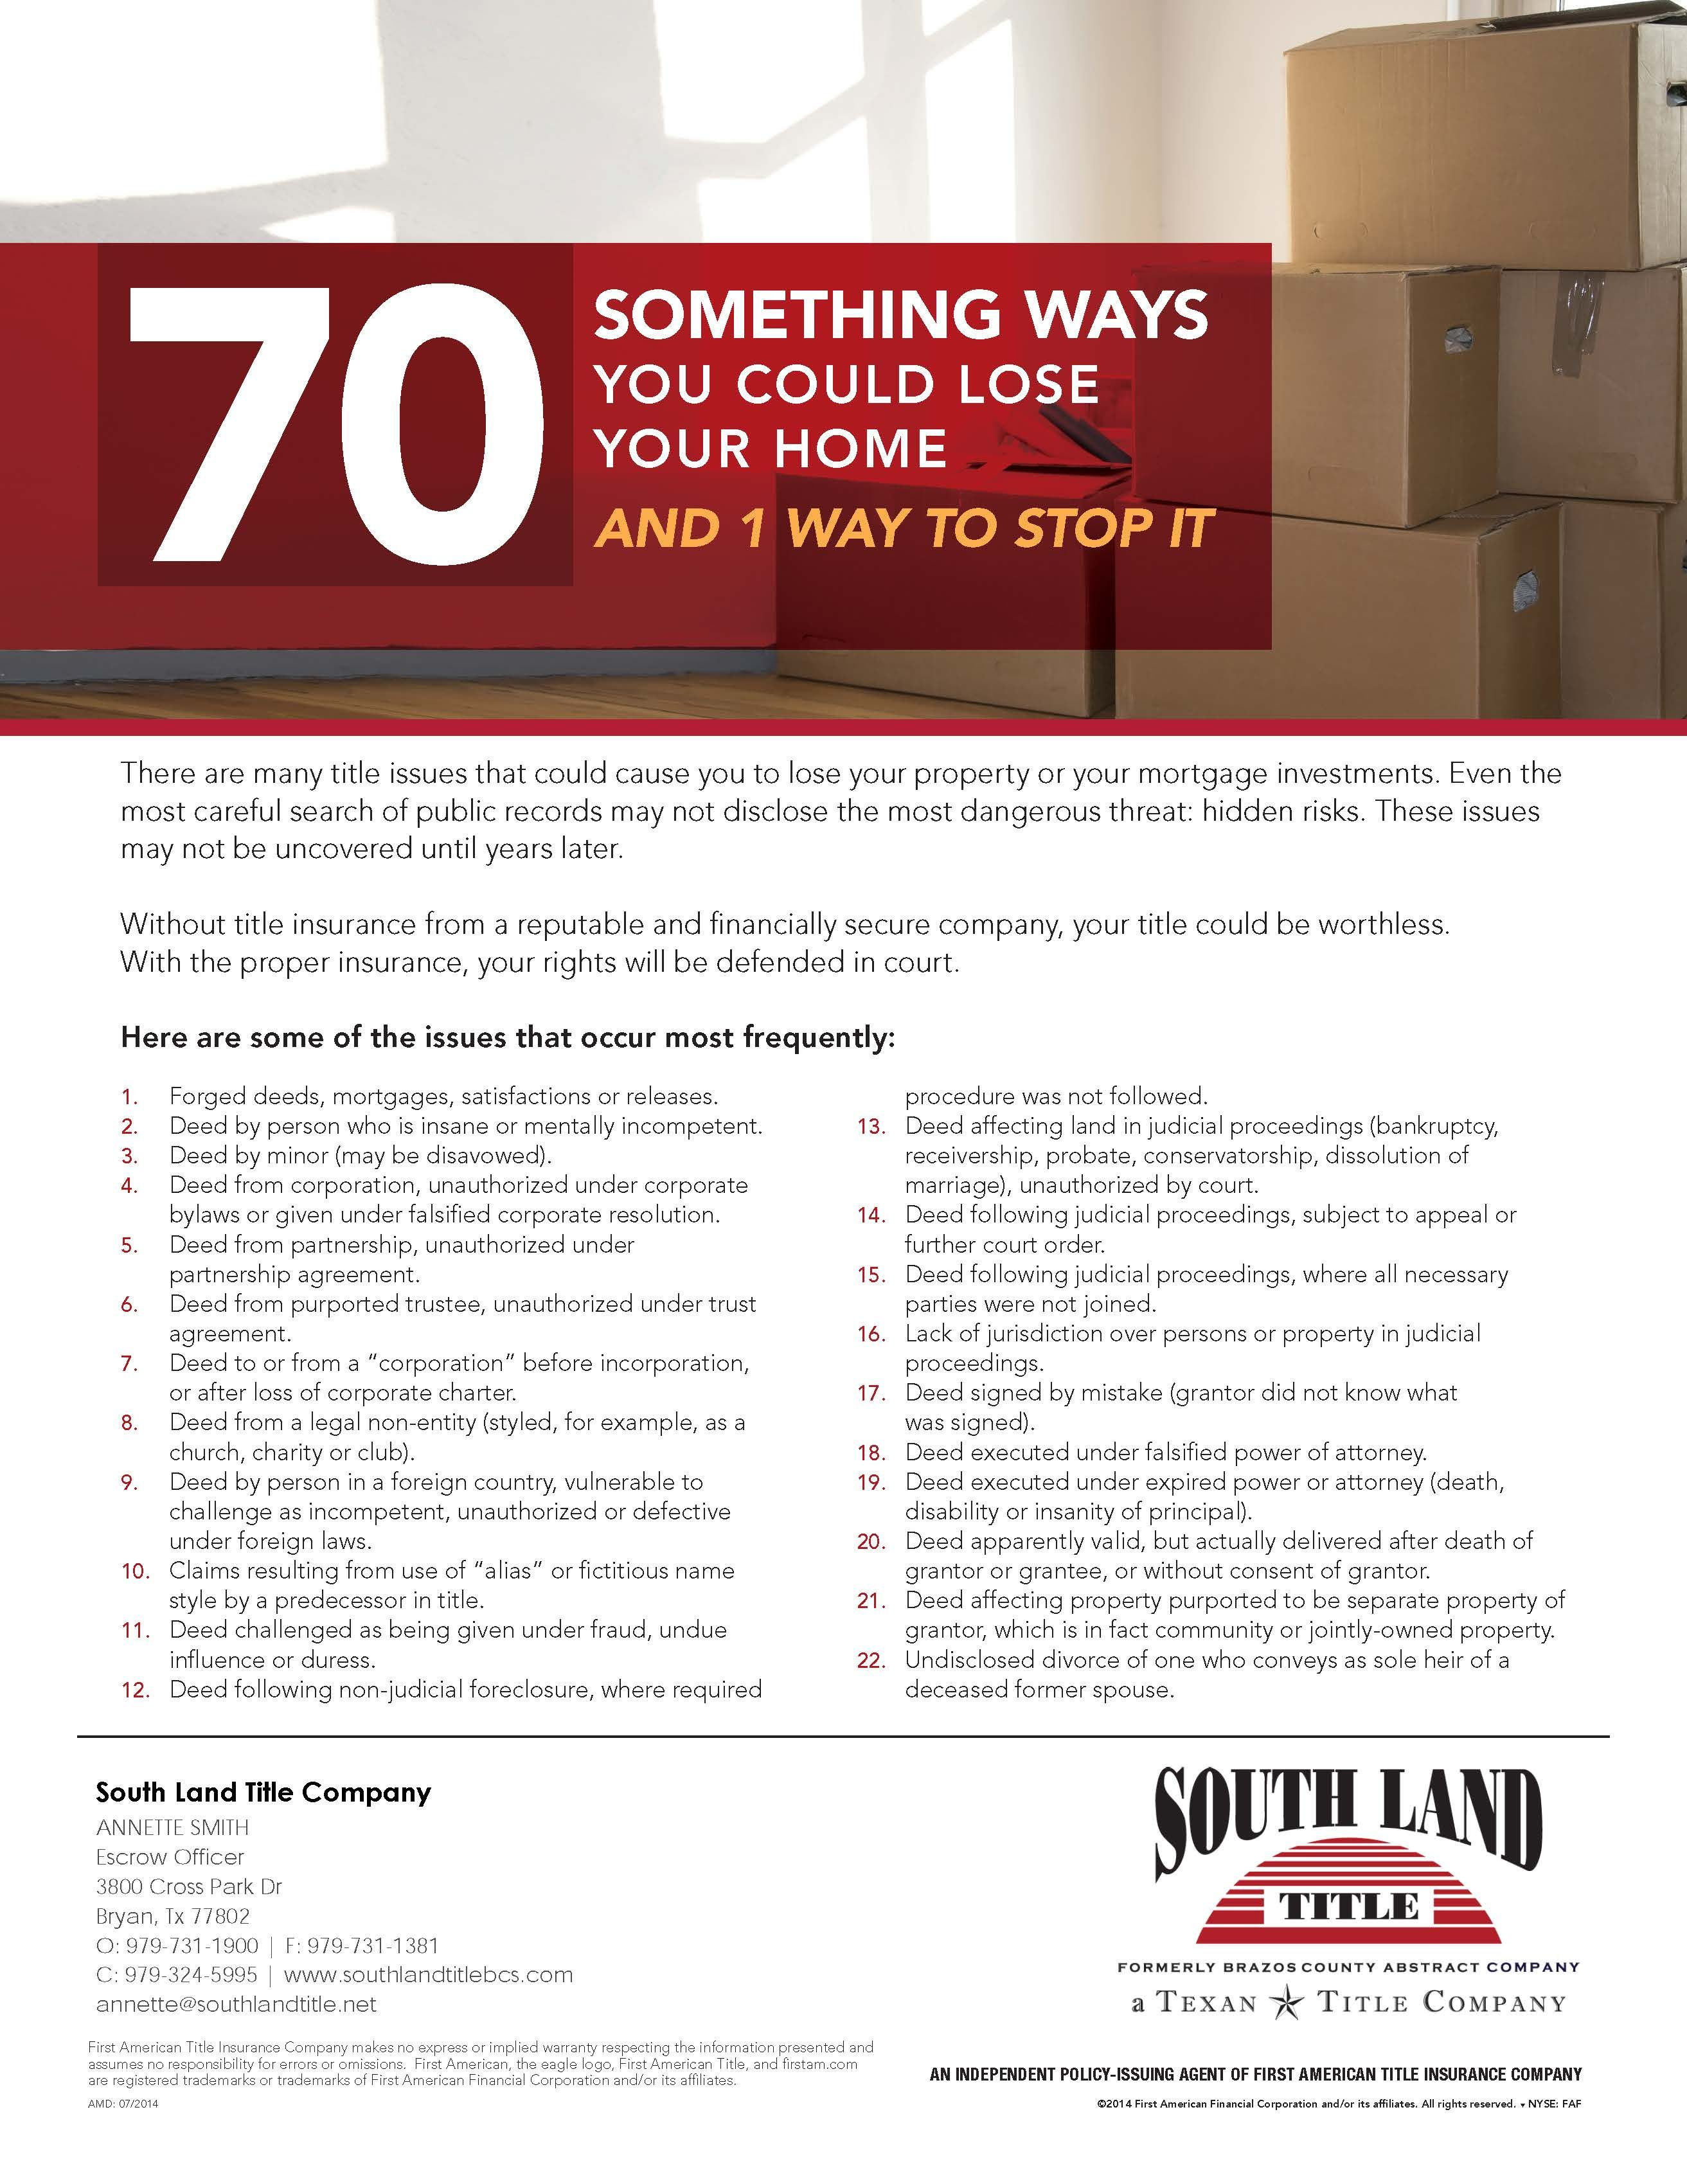 Www Southlandtitlebcs Com Public Records Investing Stop It